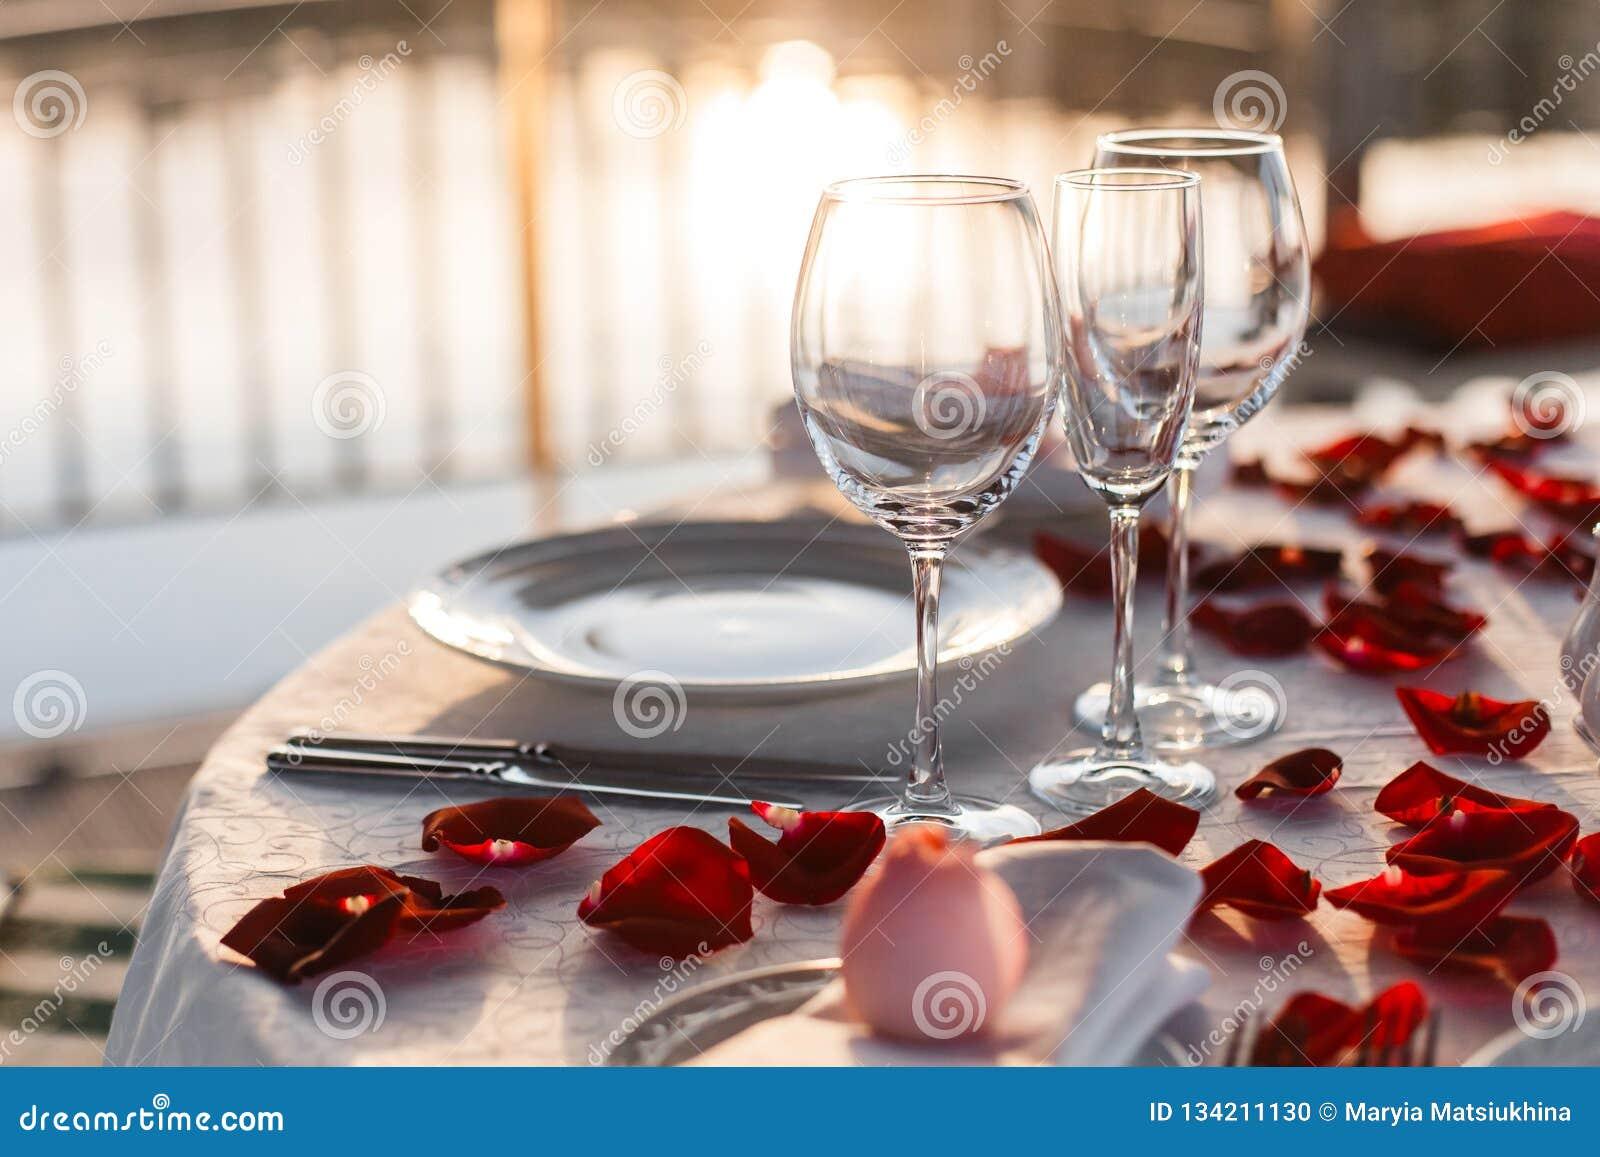 Romantic Valentine`s Day dinner setup with rose petals